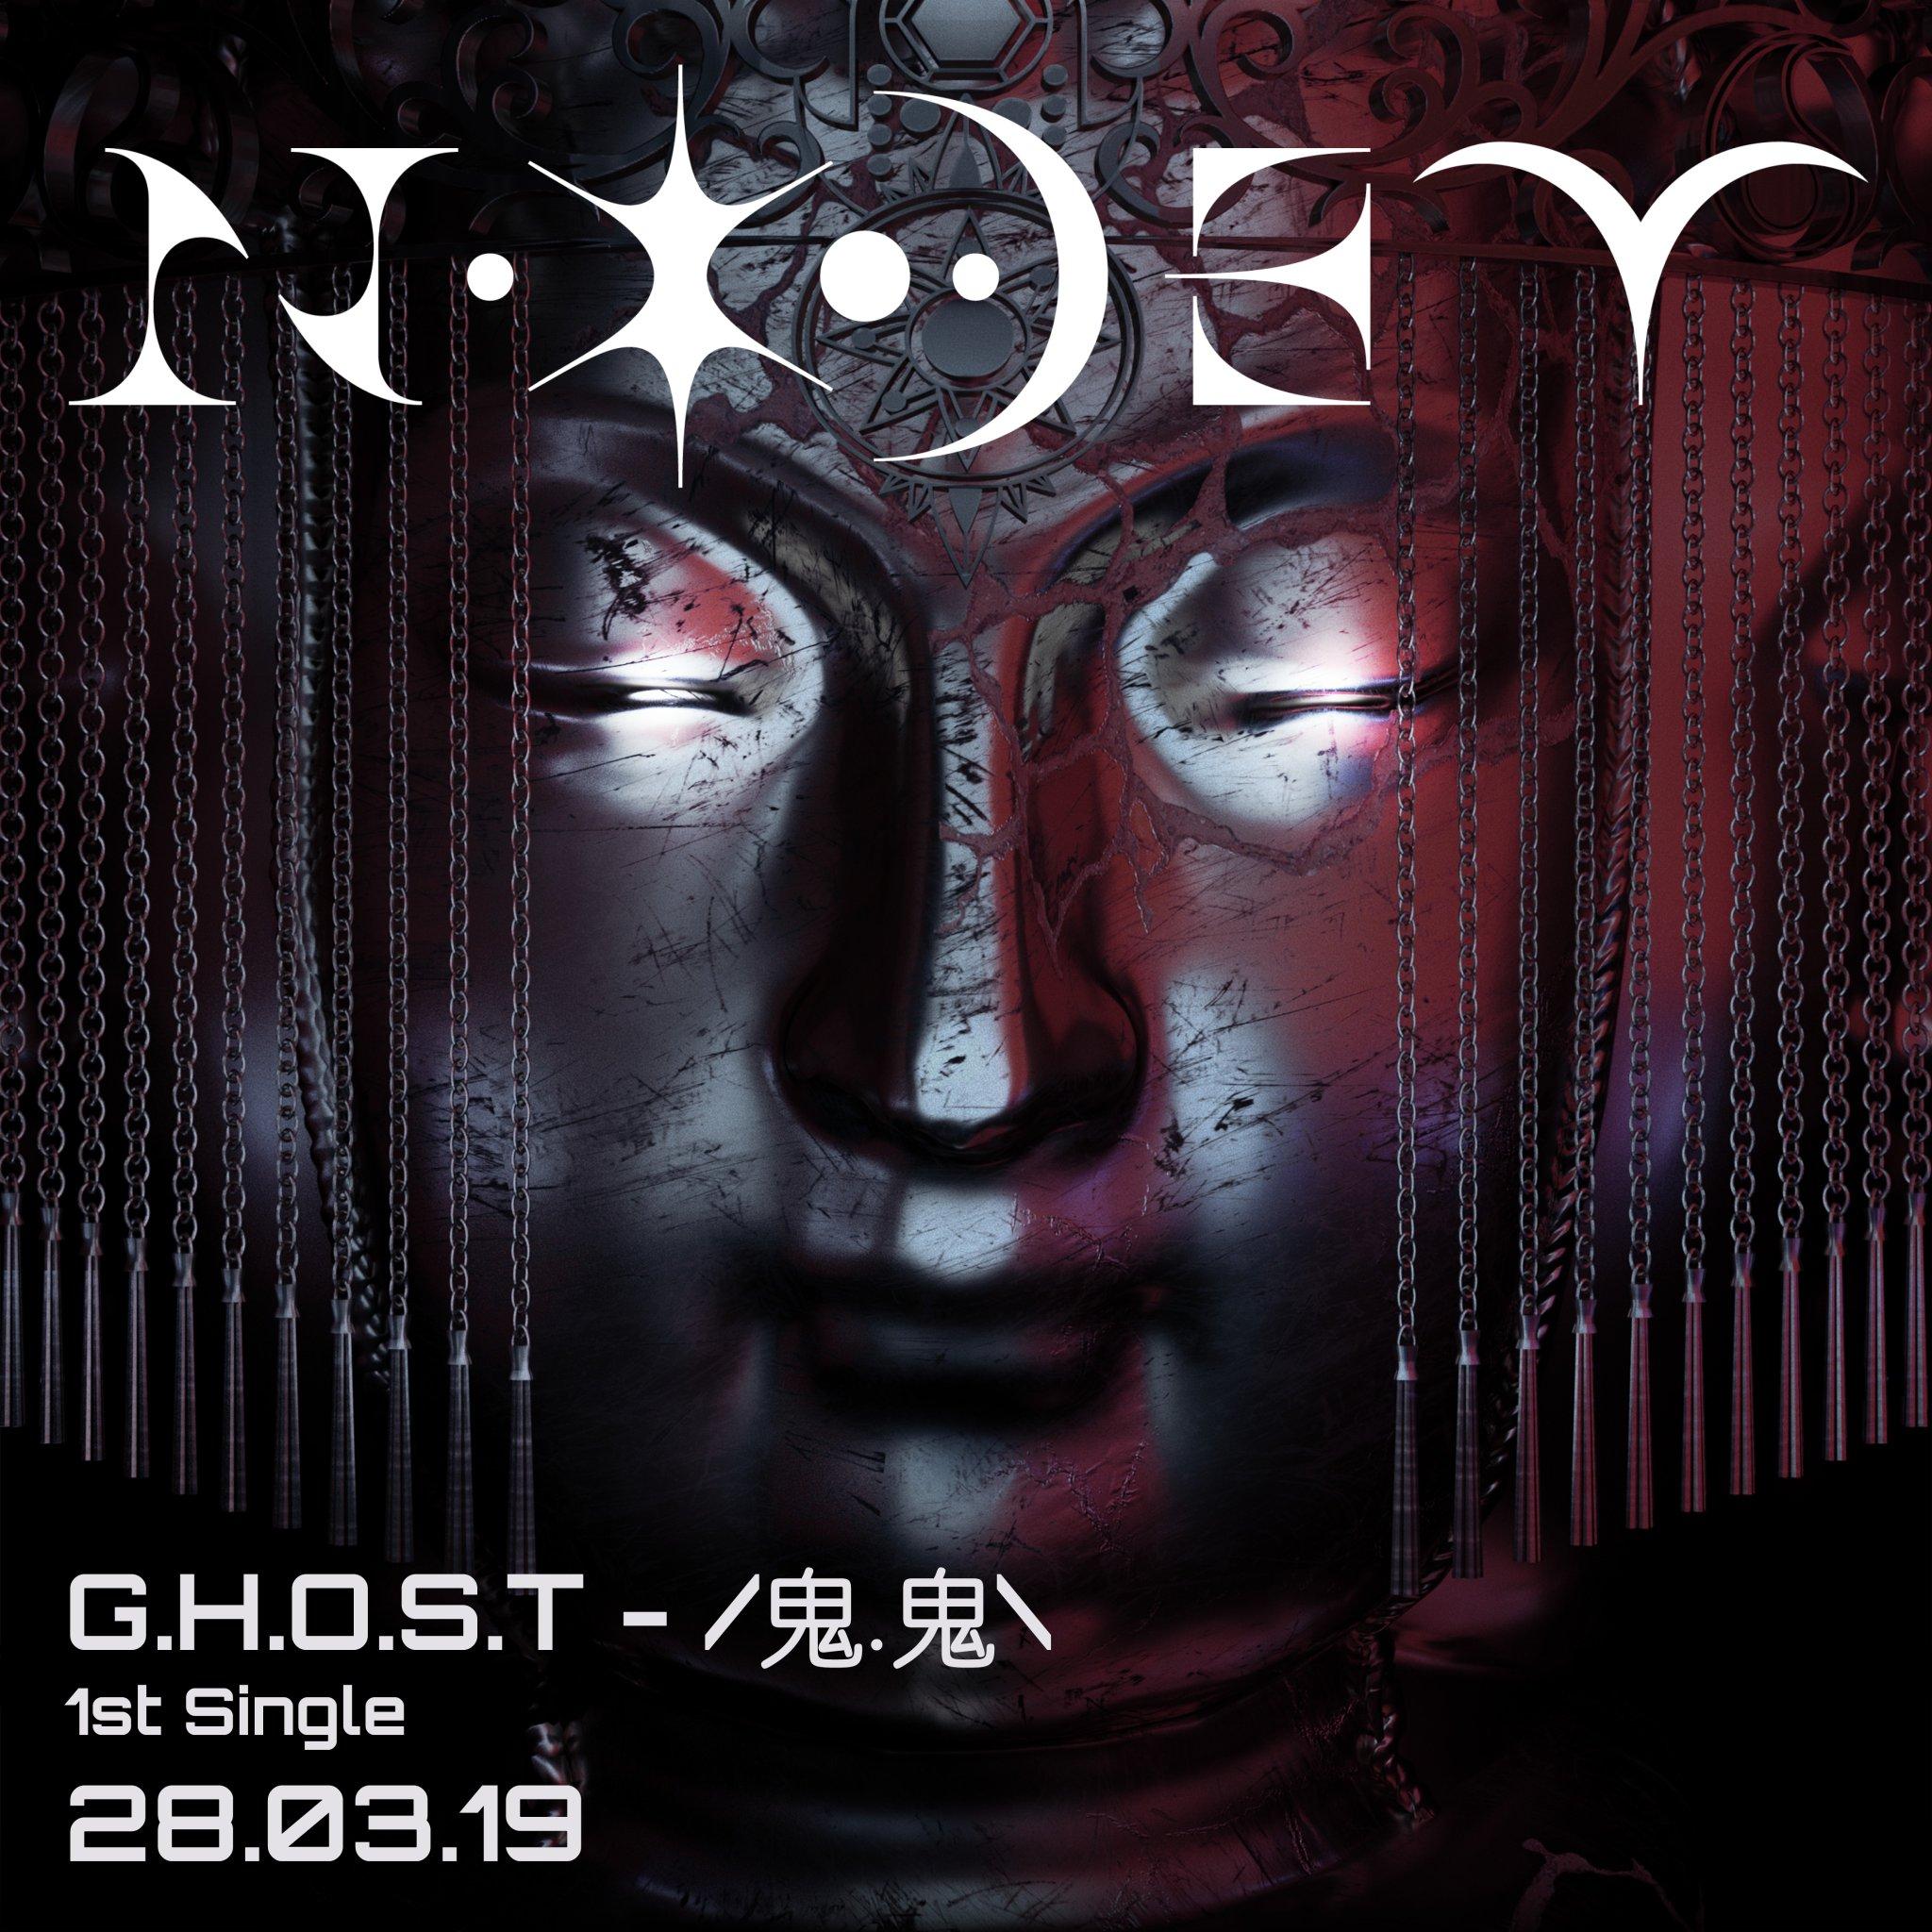 ghost - nodey